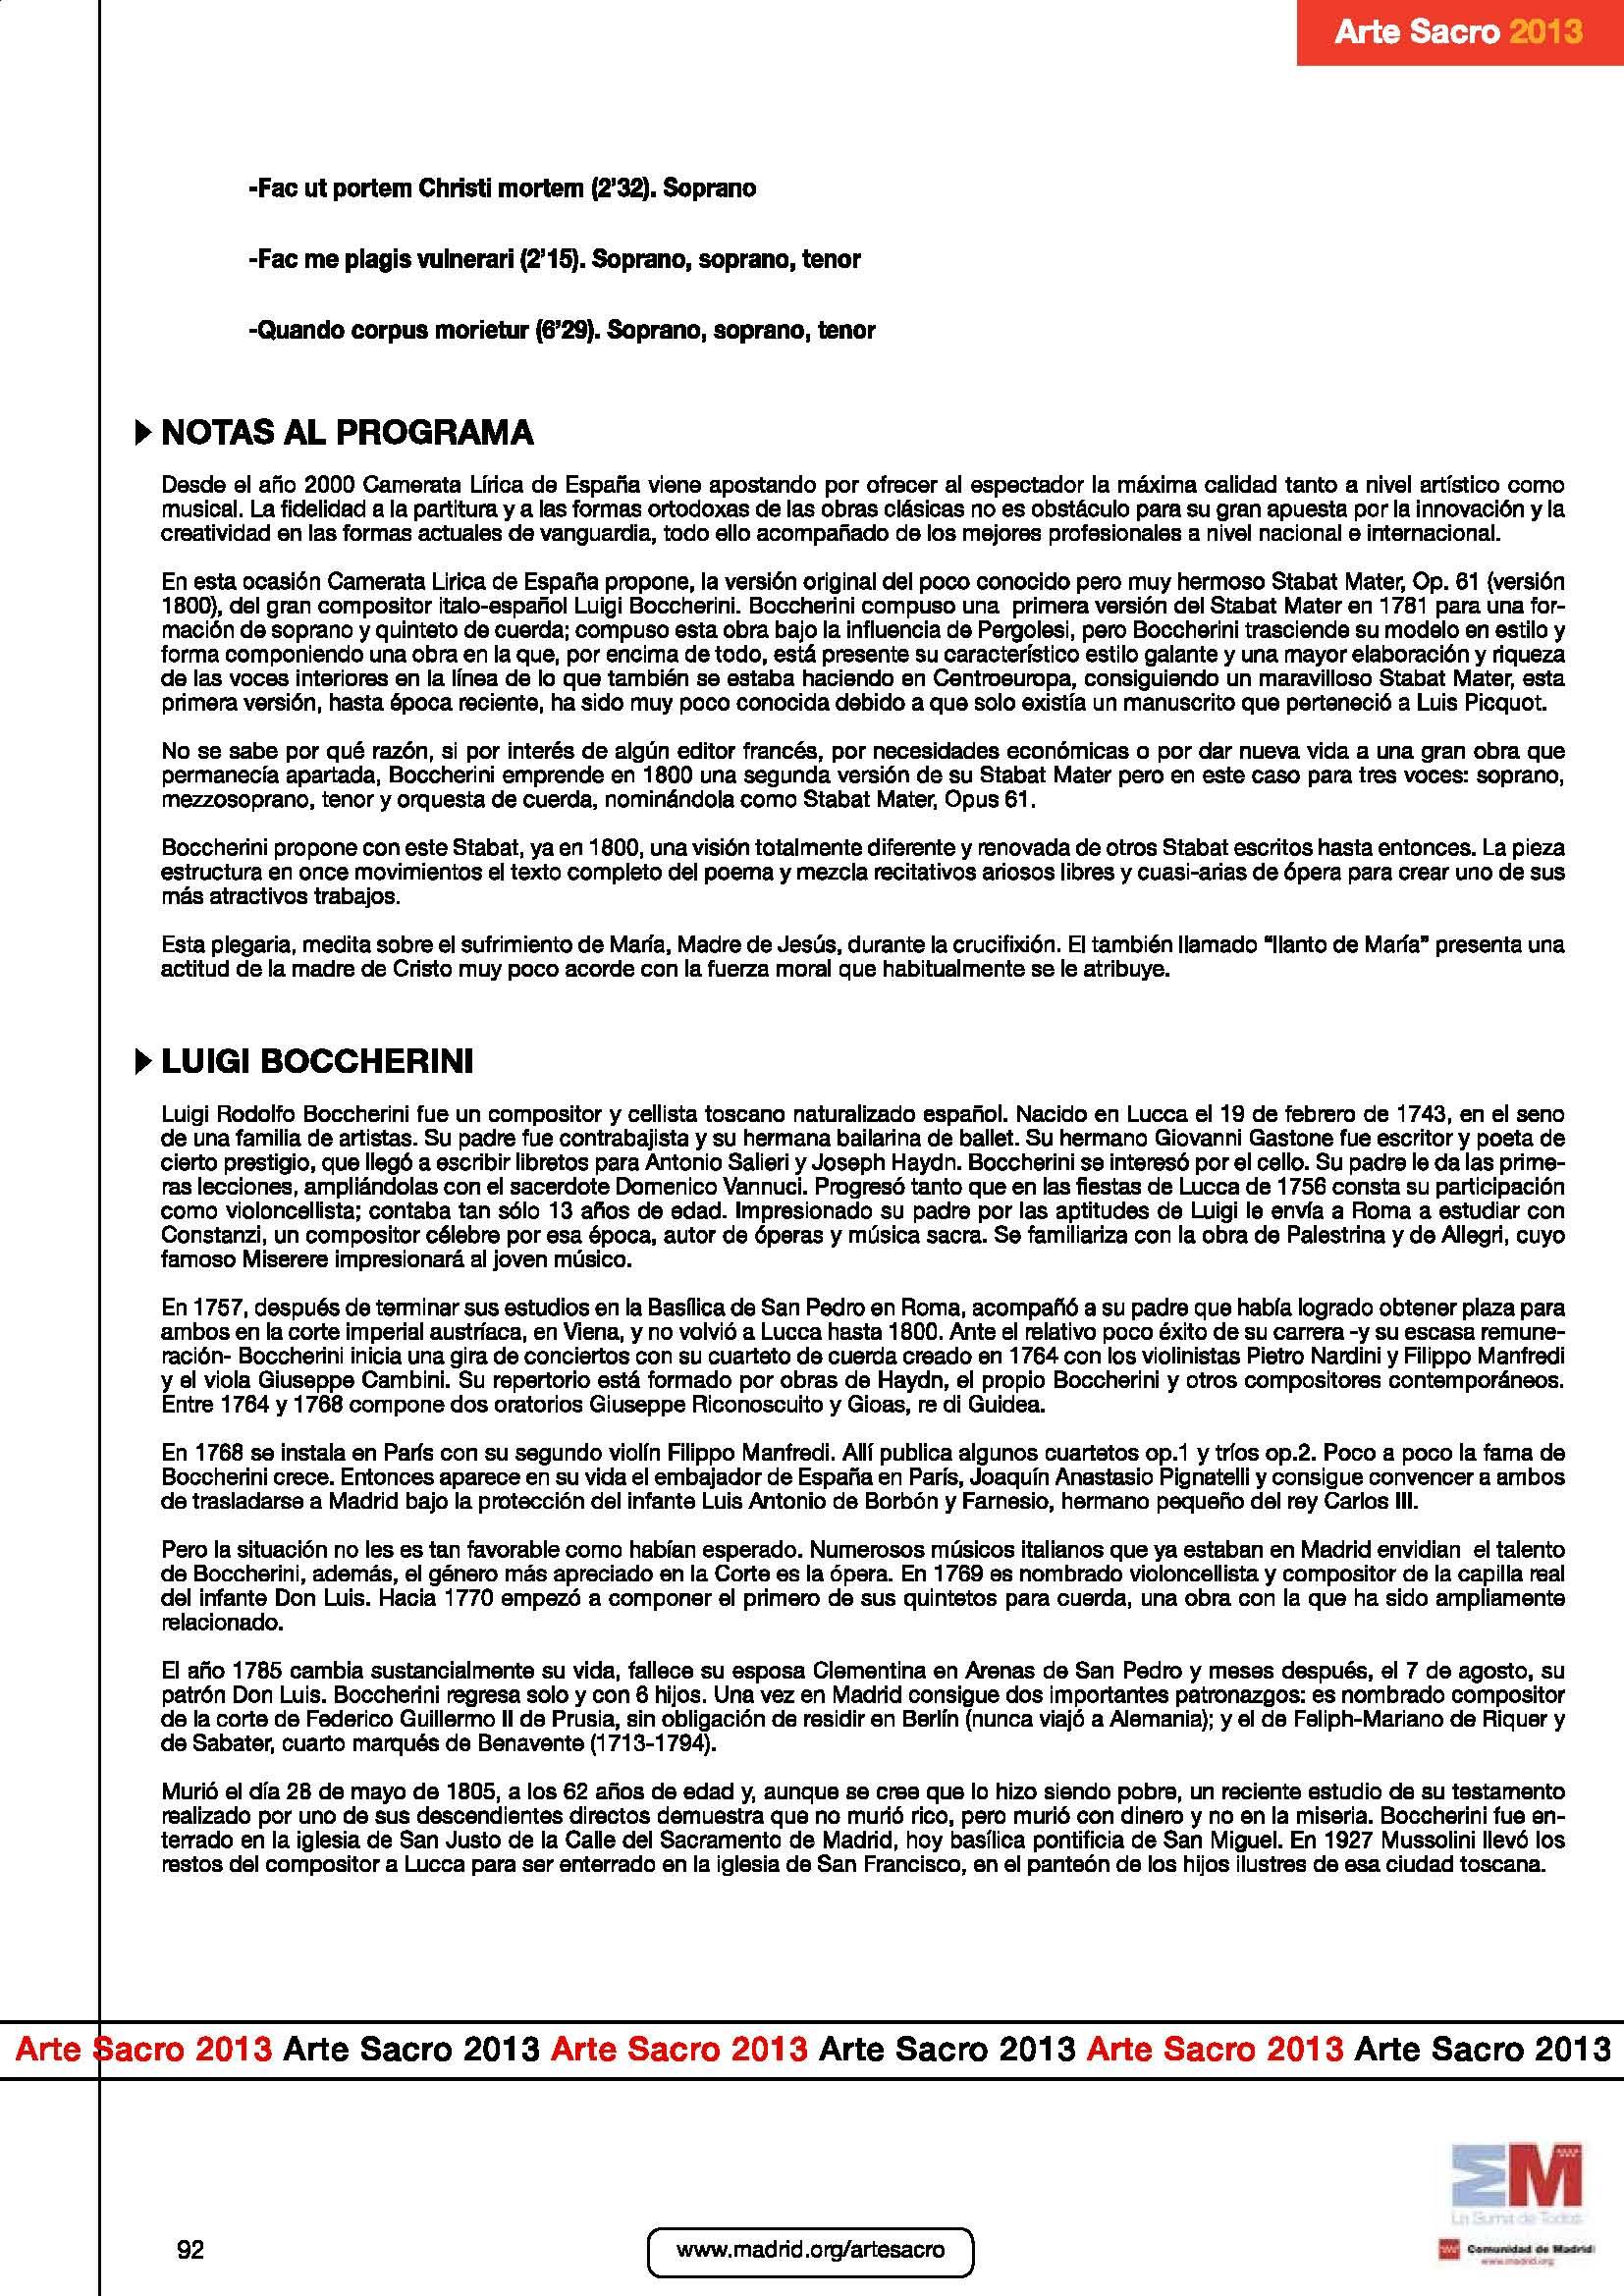 dossier_completo_Página_092